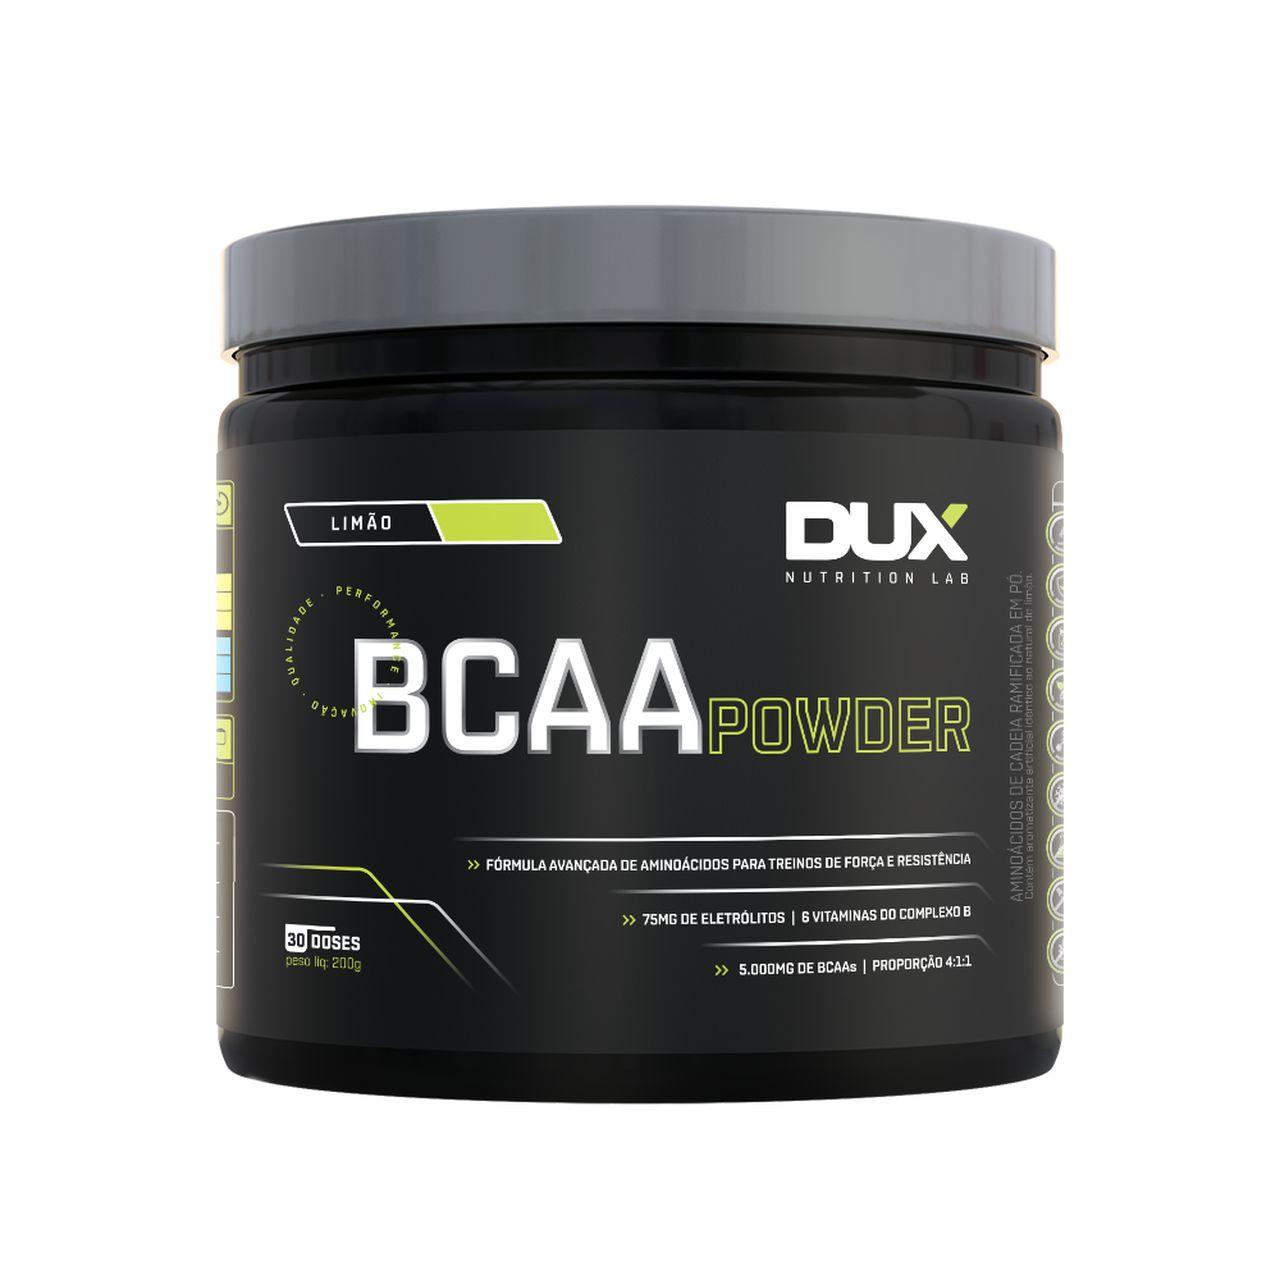 BCAA Powder 200g Dux Nutrition